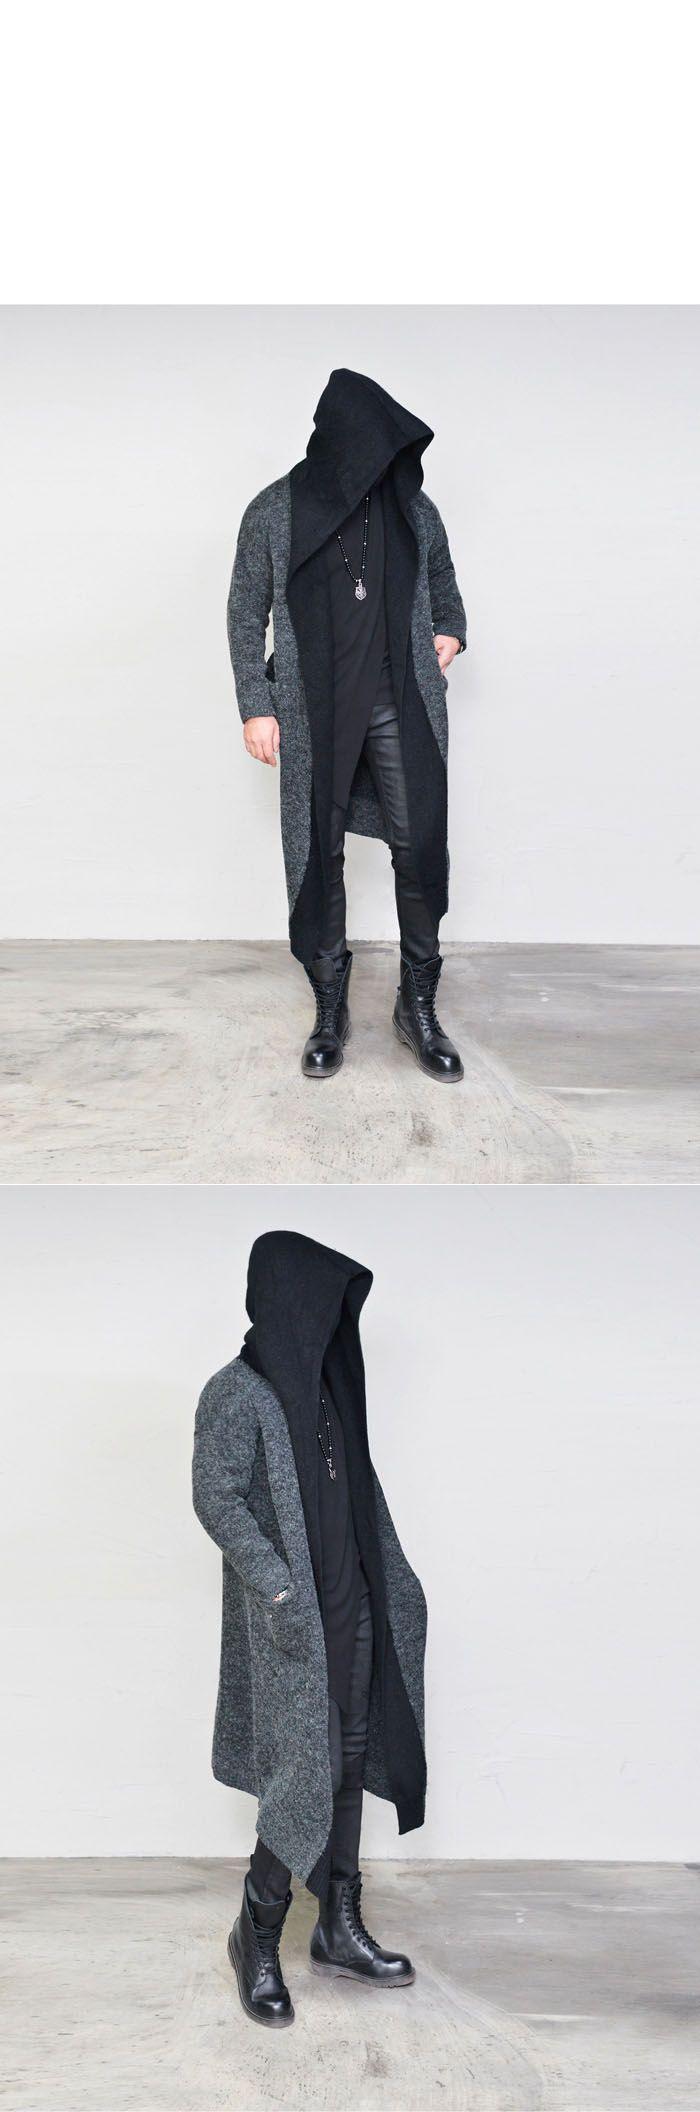 Contrast Hooded Wool Long-Cardigan 208 - GUYLOOK